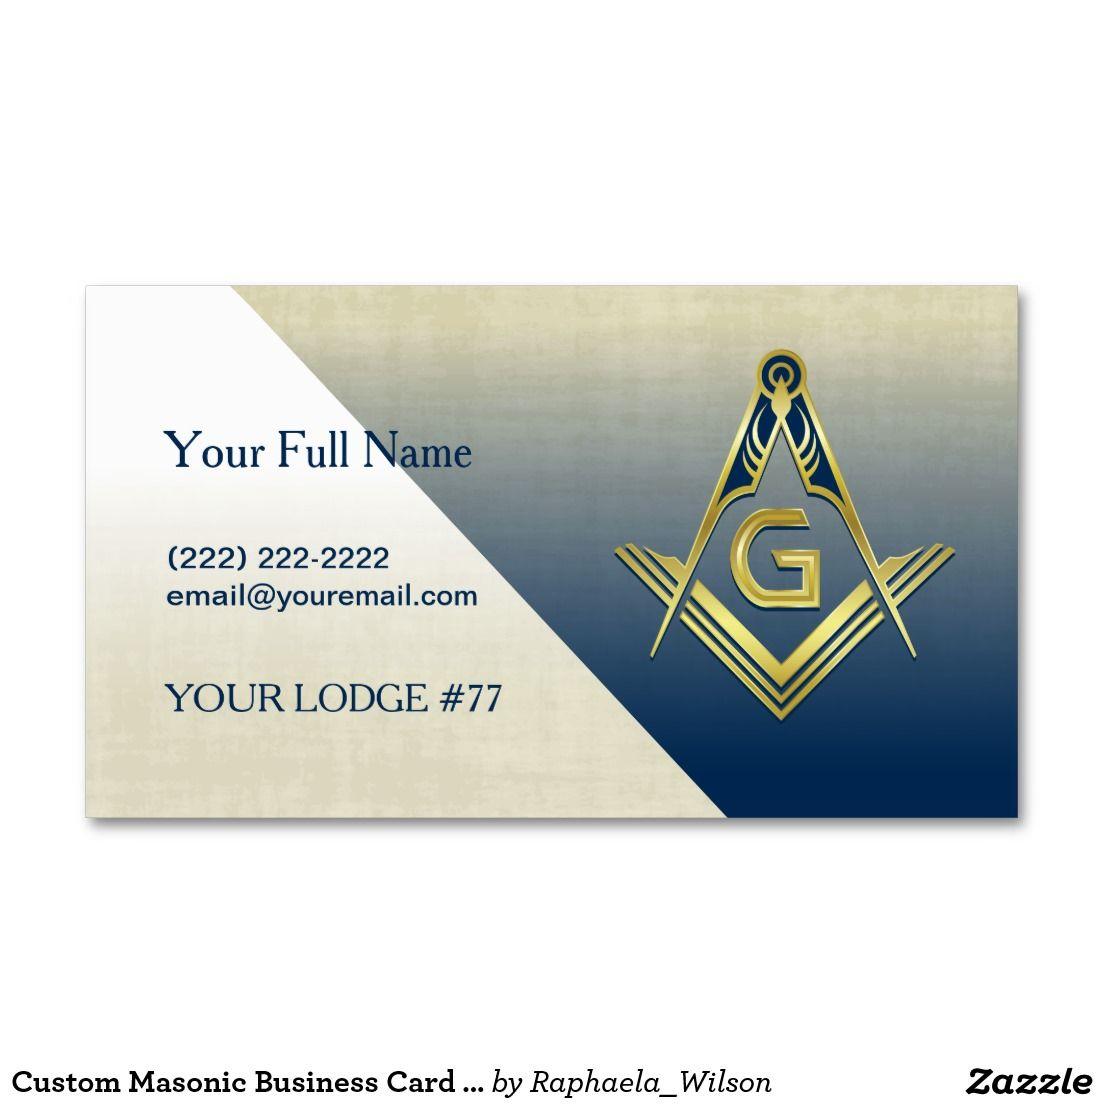 Custom Masonic Business Card Template, Navy & Gold | Card templates ...